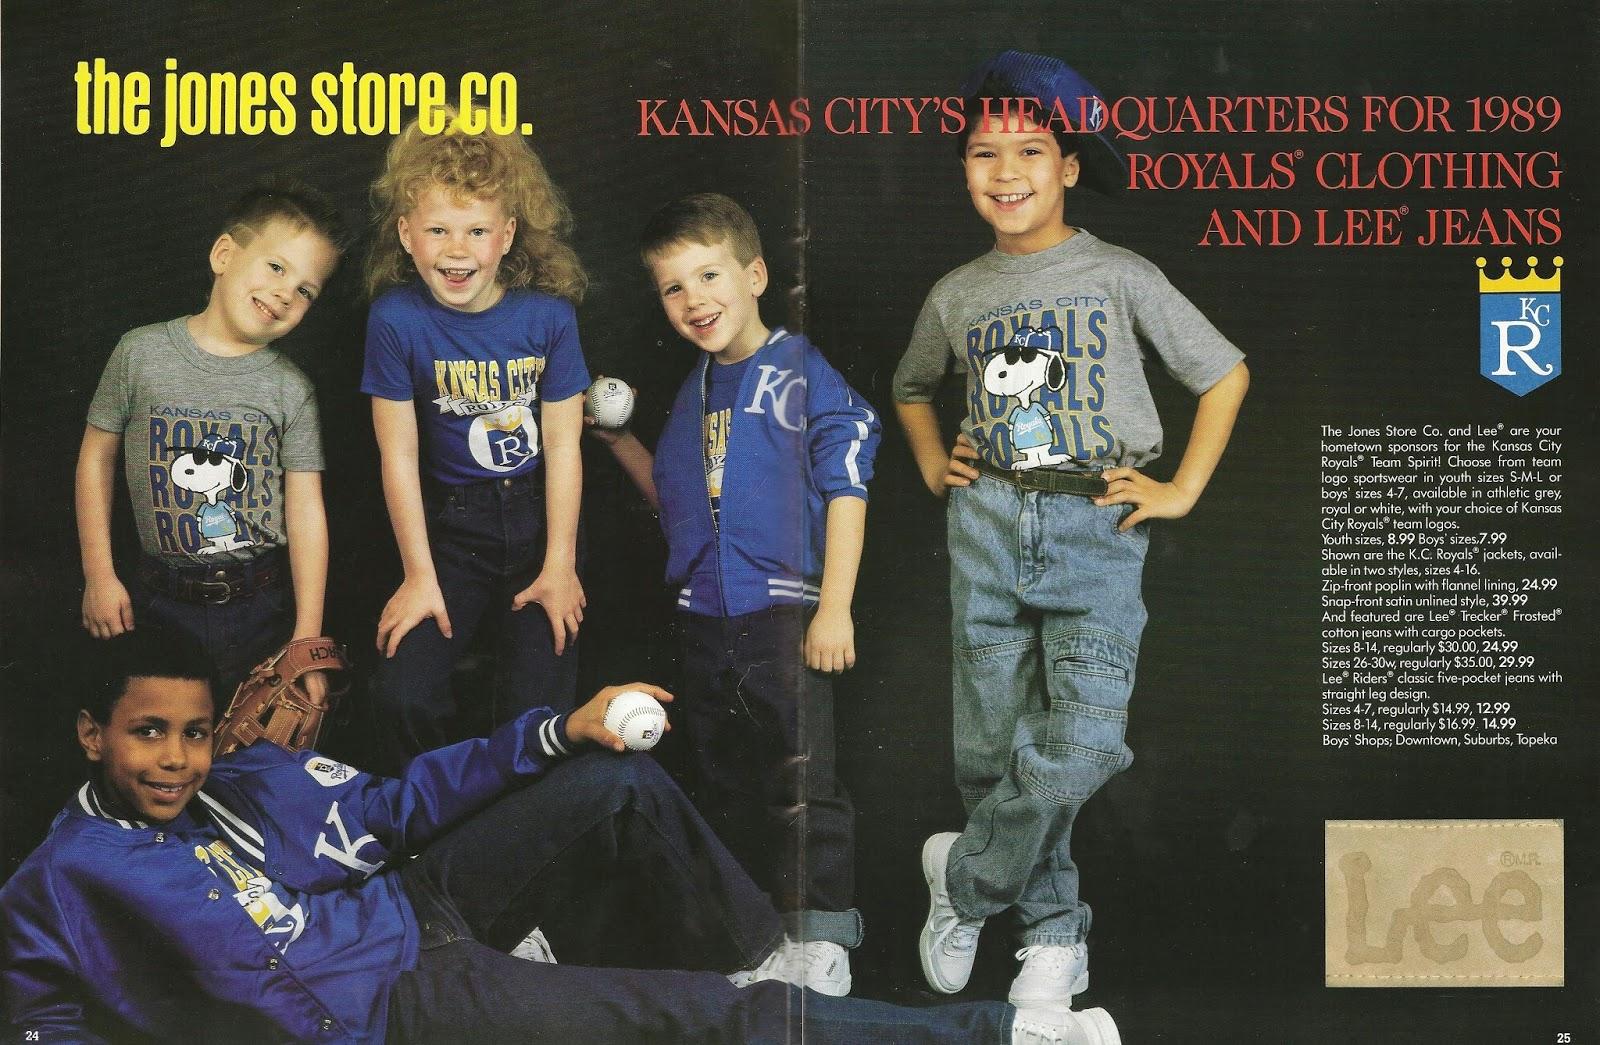 http://3.bp.blogspot.com/-ellm4KXCwRk/U9fGZARvOUI/AAAAAAAANHk/TmzxB0NwR9M/s1600/1989-royals-jones-store-ad.jpg